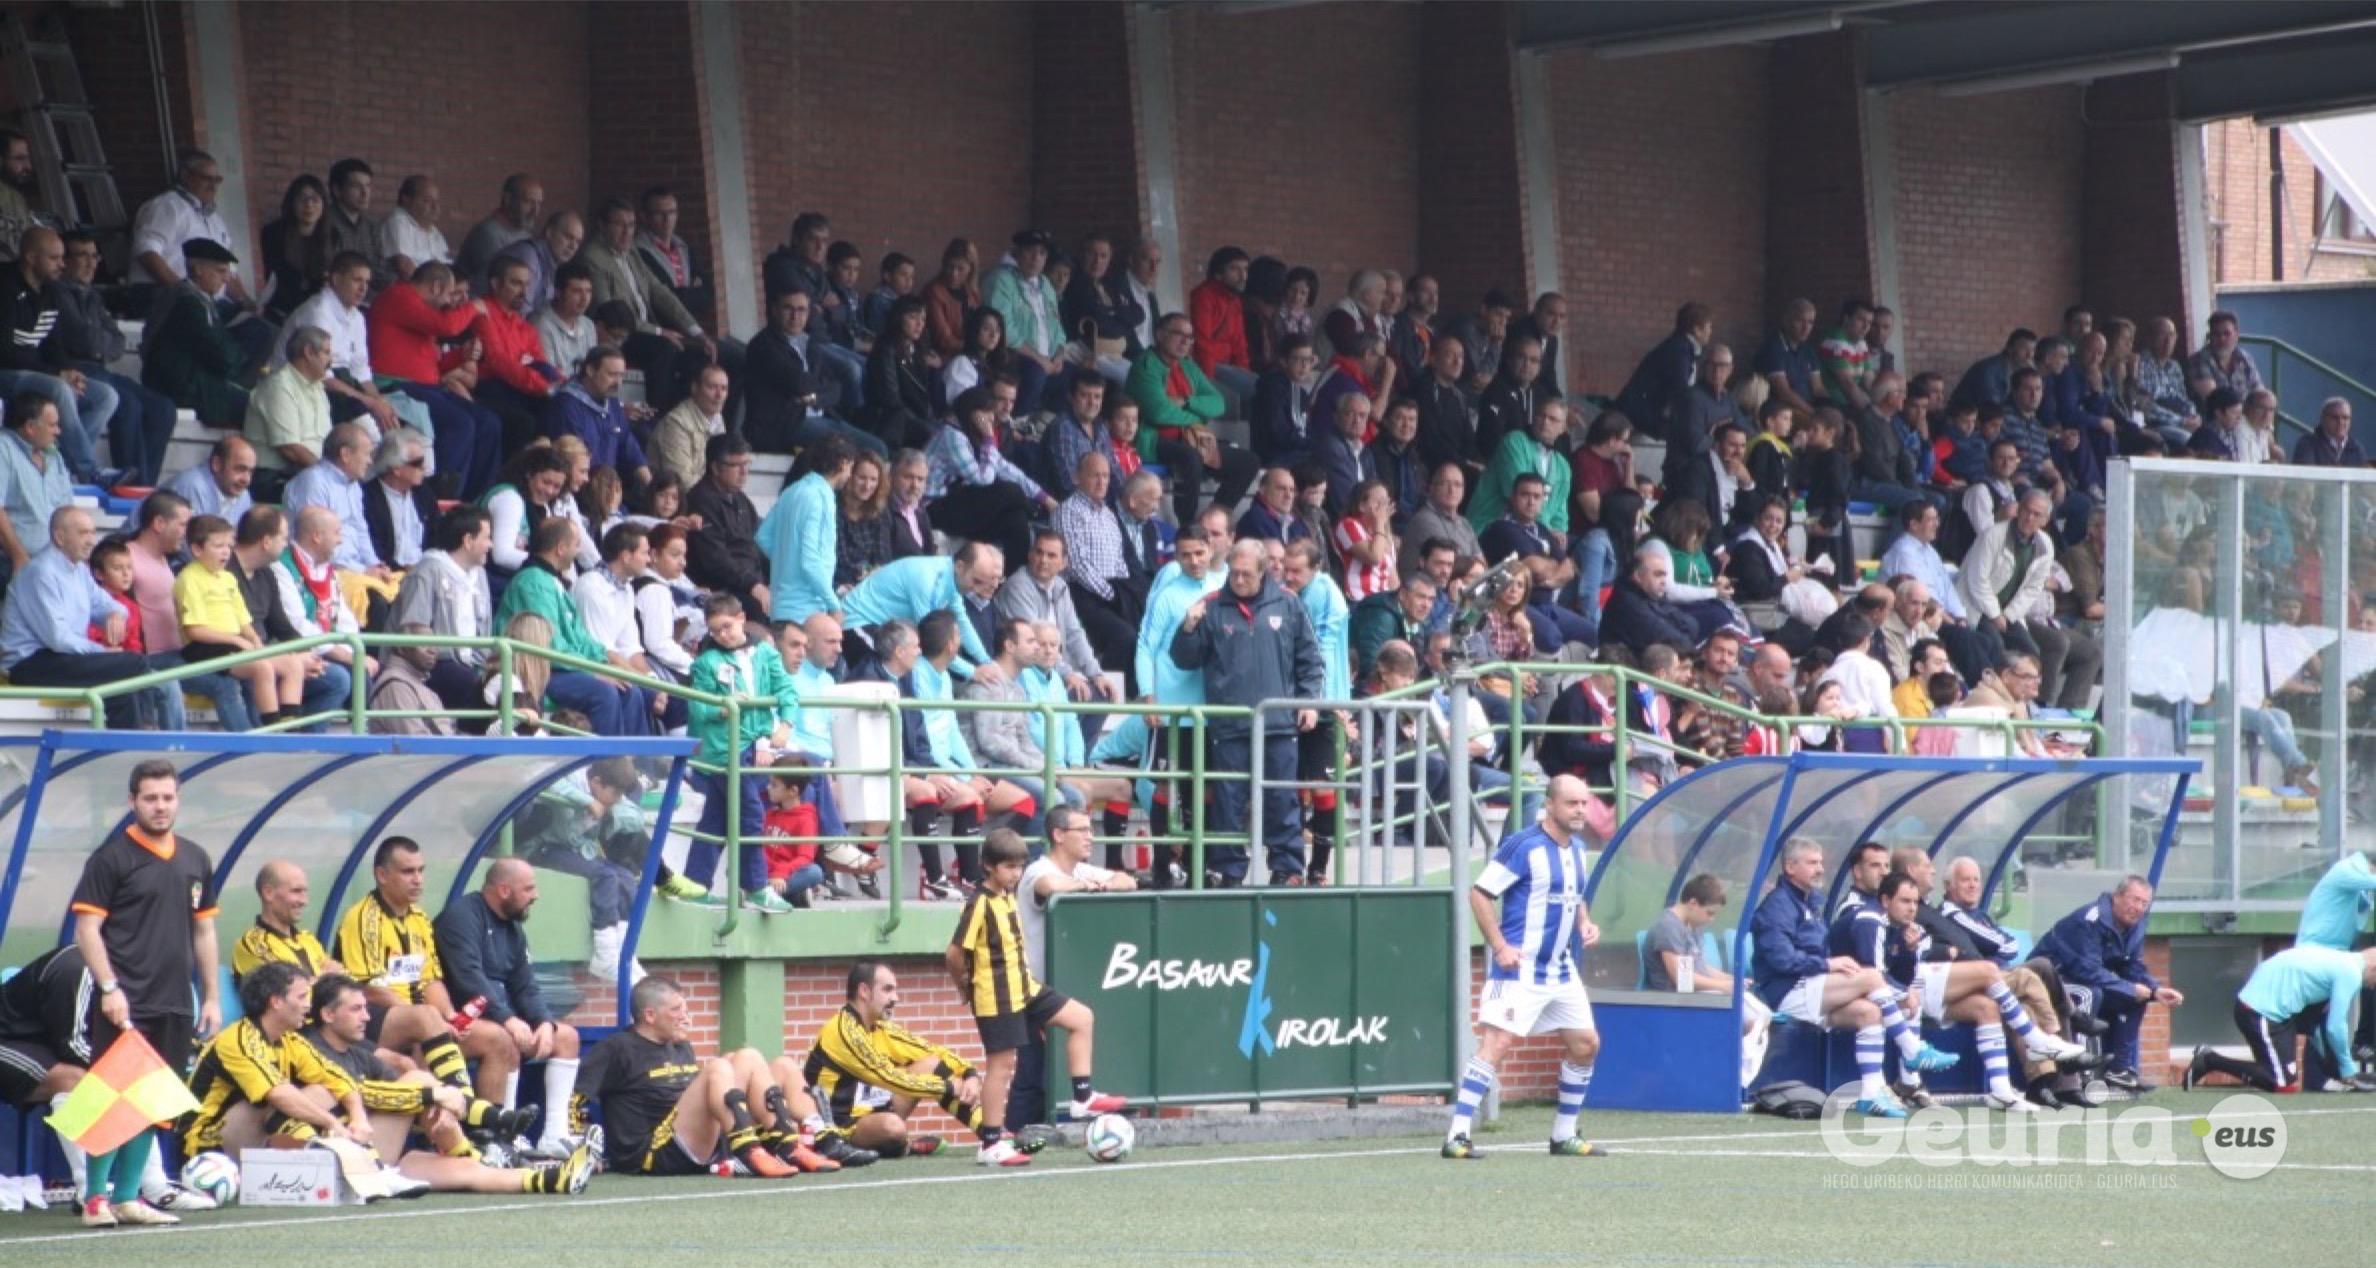 basauri_san_fausto_2015_futbol_basconia_beteranoak_17